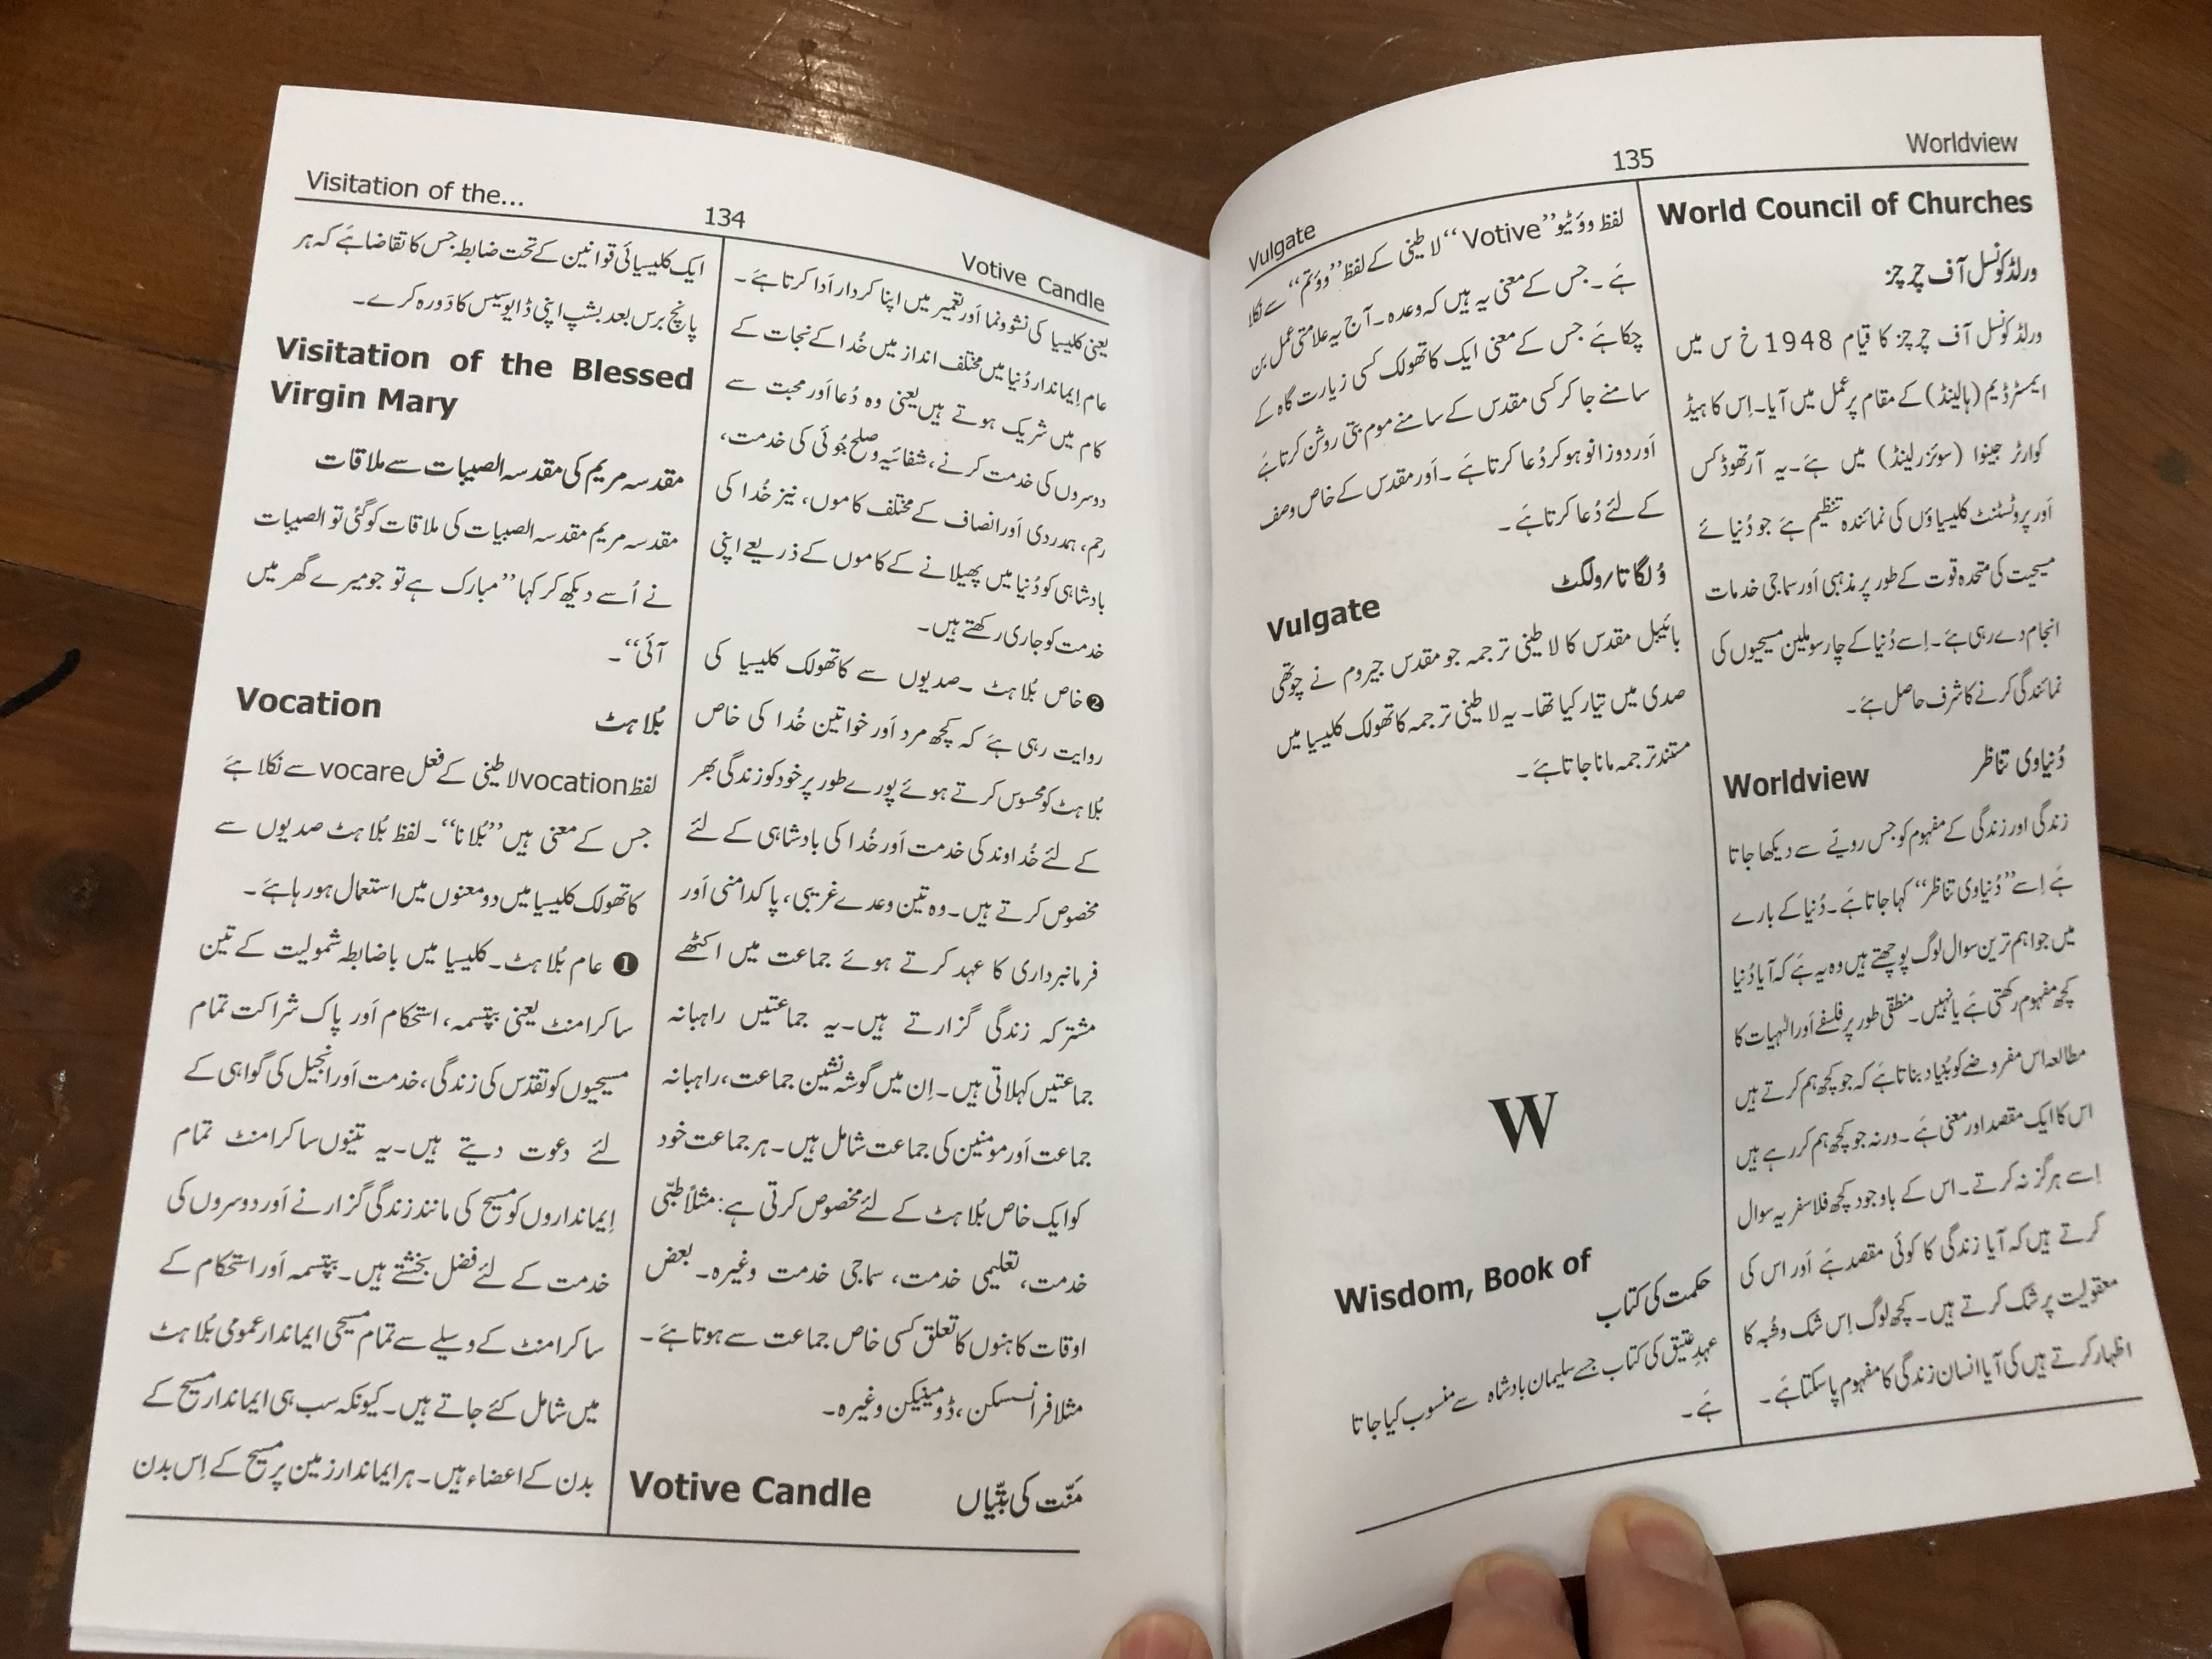 a-new-dictionary-of-christian-terminology-by-emmanuel-neno-catechetical-centre-karachi-2009-10-.jpg